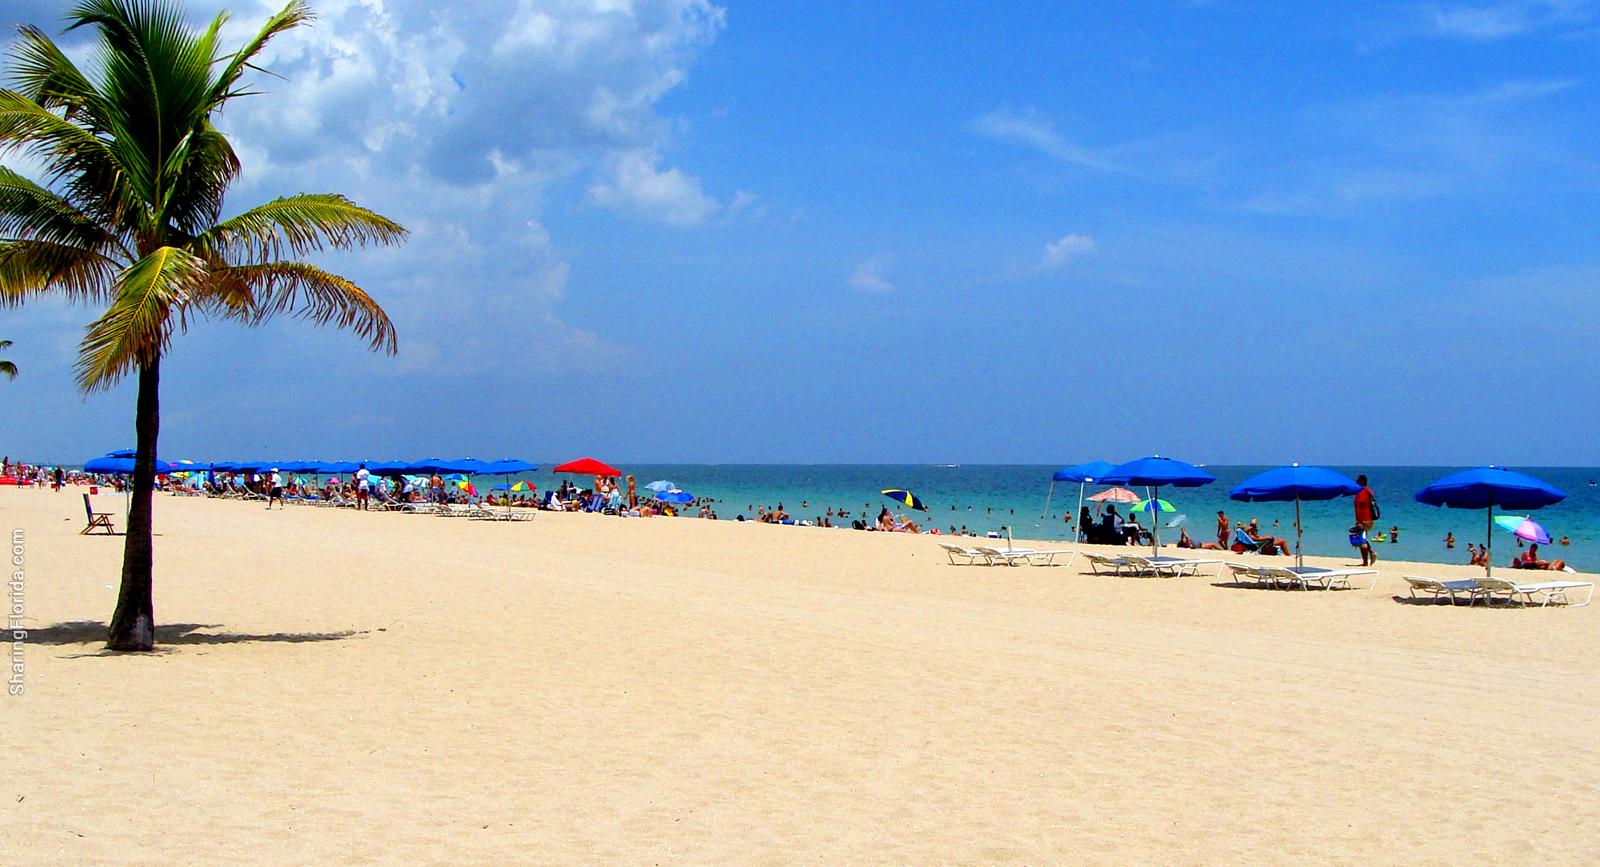 Address Ft Lauderdale Beach Ft Lauderdale Florida 1600x867